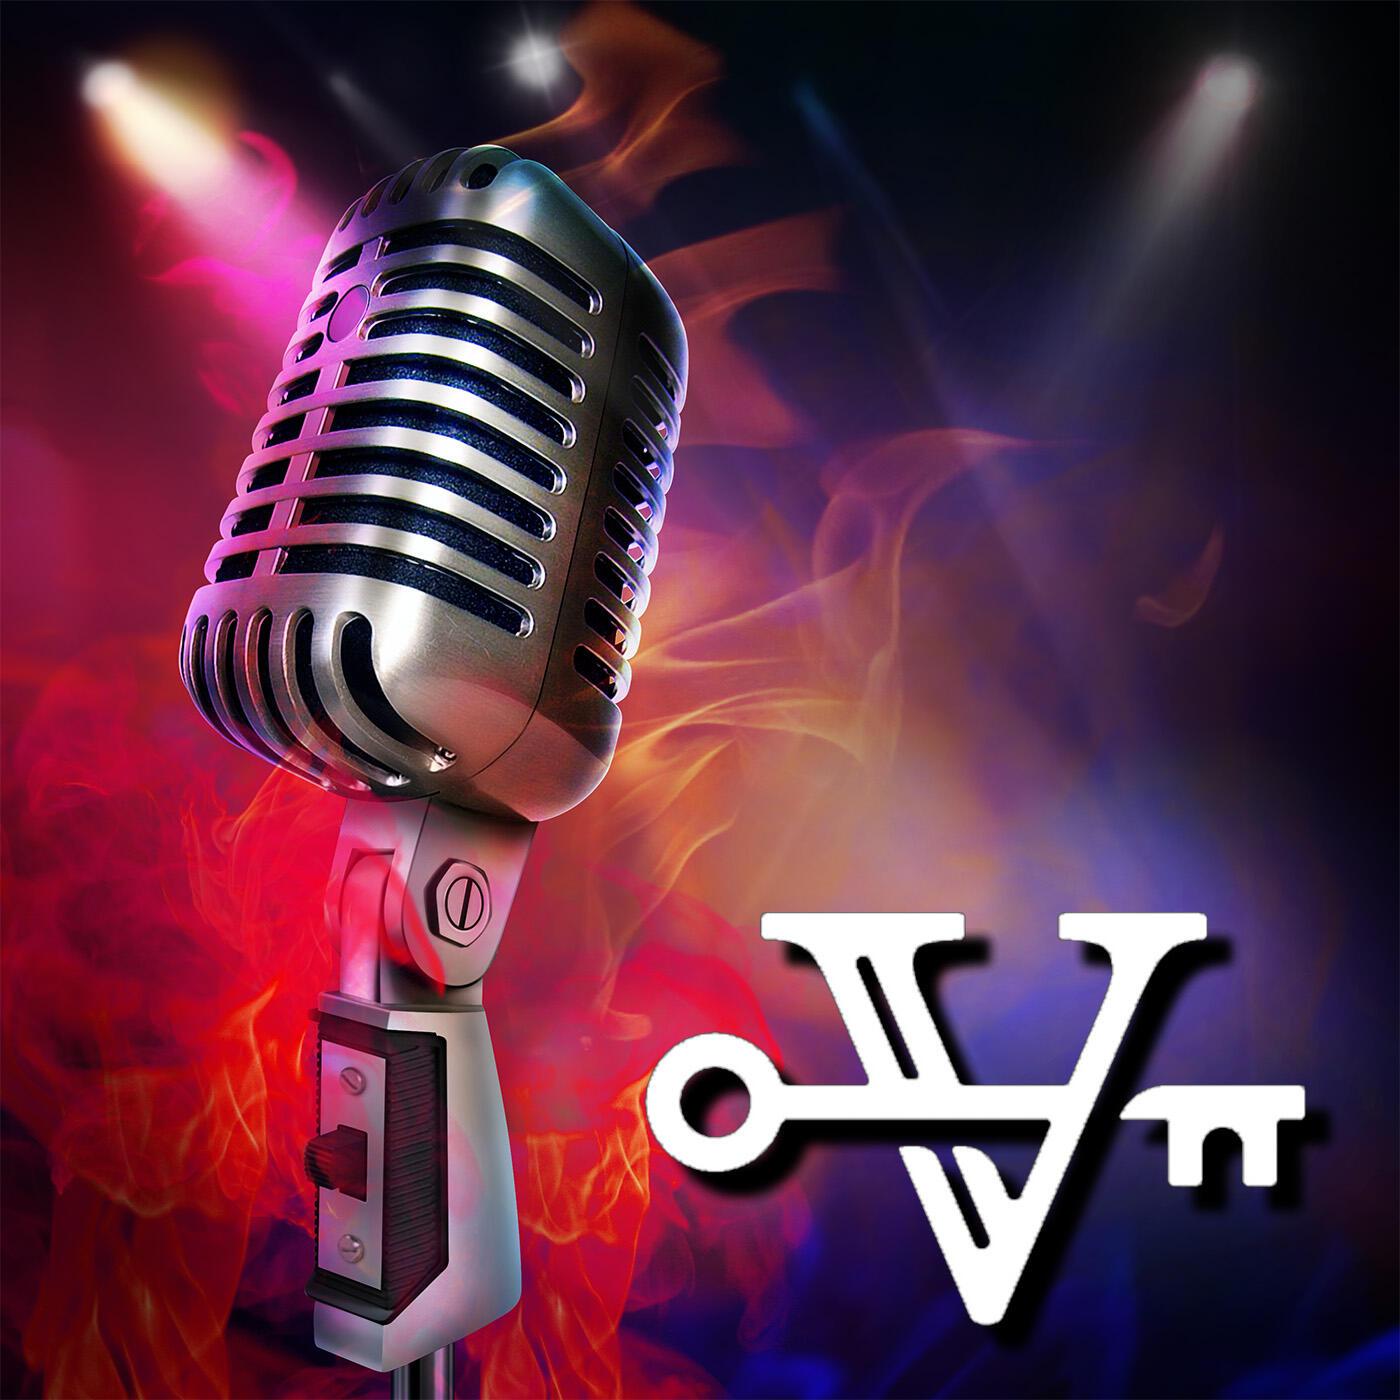 VERITAS w/ Mel Hostalrich   [Non-Member Feed]   Subscribe at VeritasRadio.com to listen to all parts.